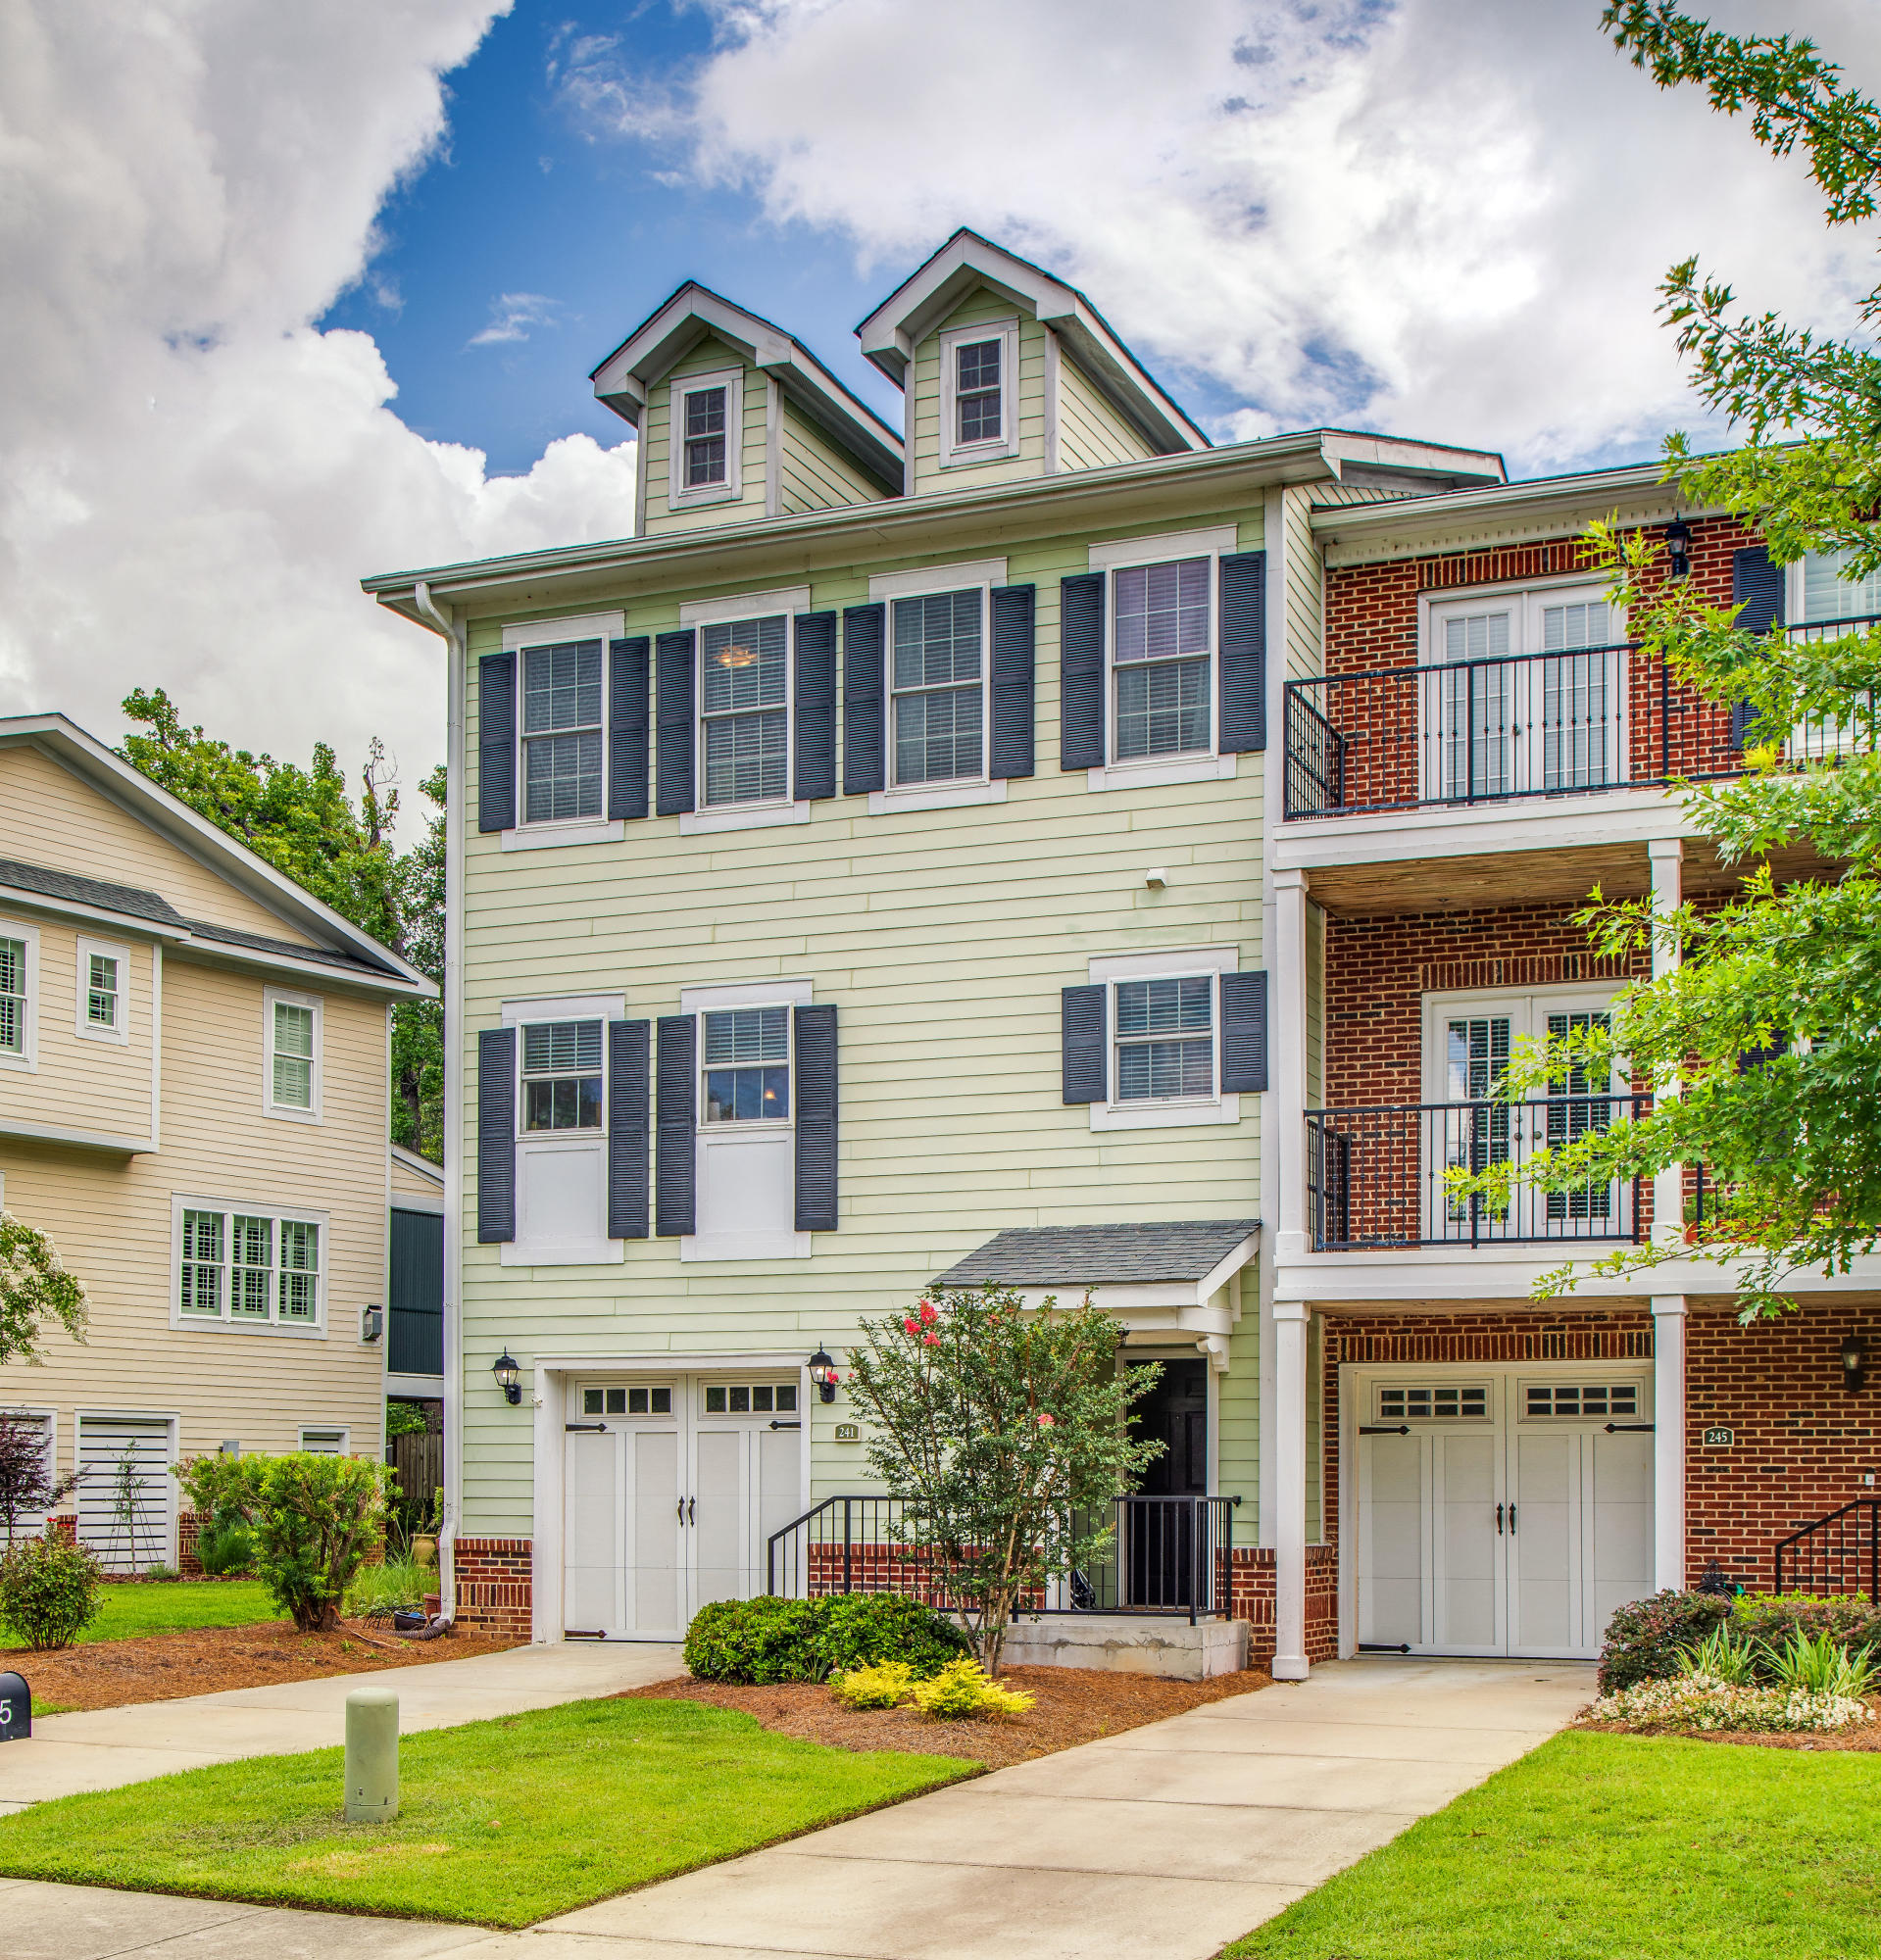 Etiwan Pointe Homes For Sale - 241 Etiwan Pointe, Mount Pleasant, SC - 11